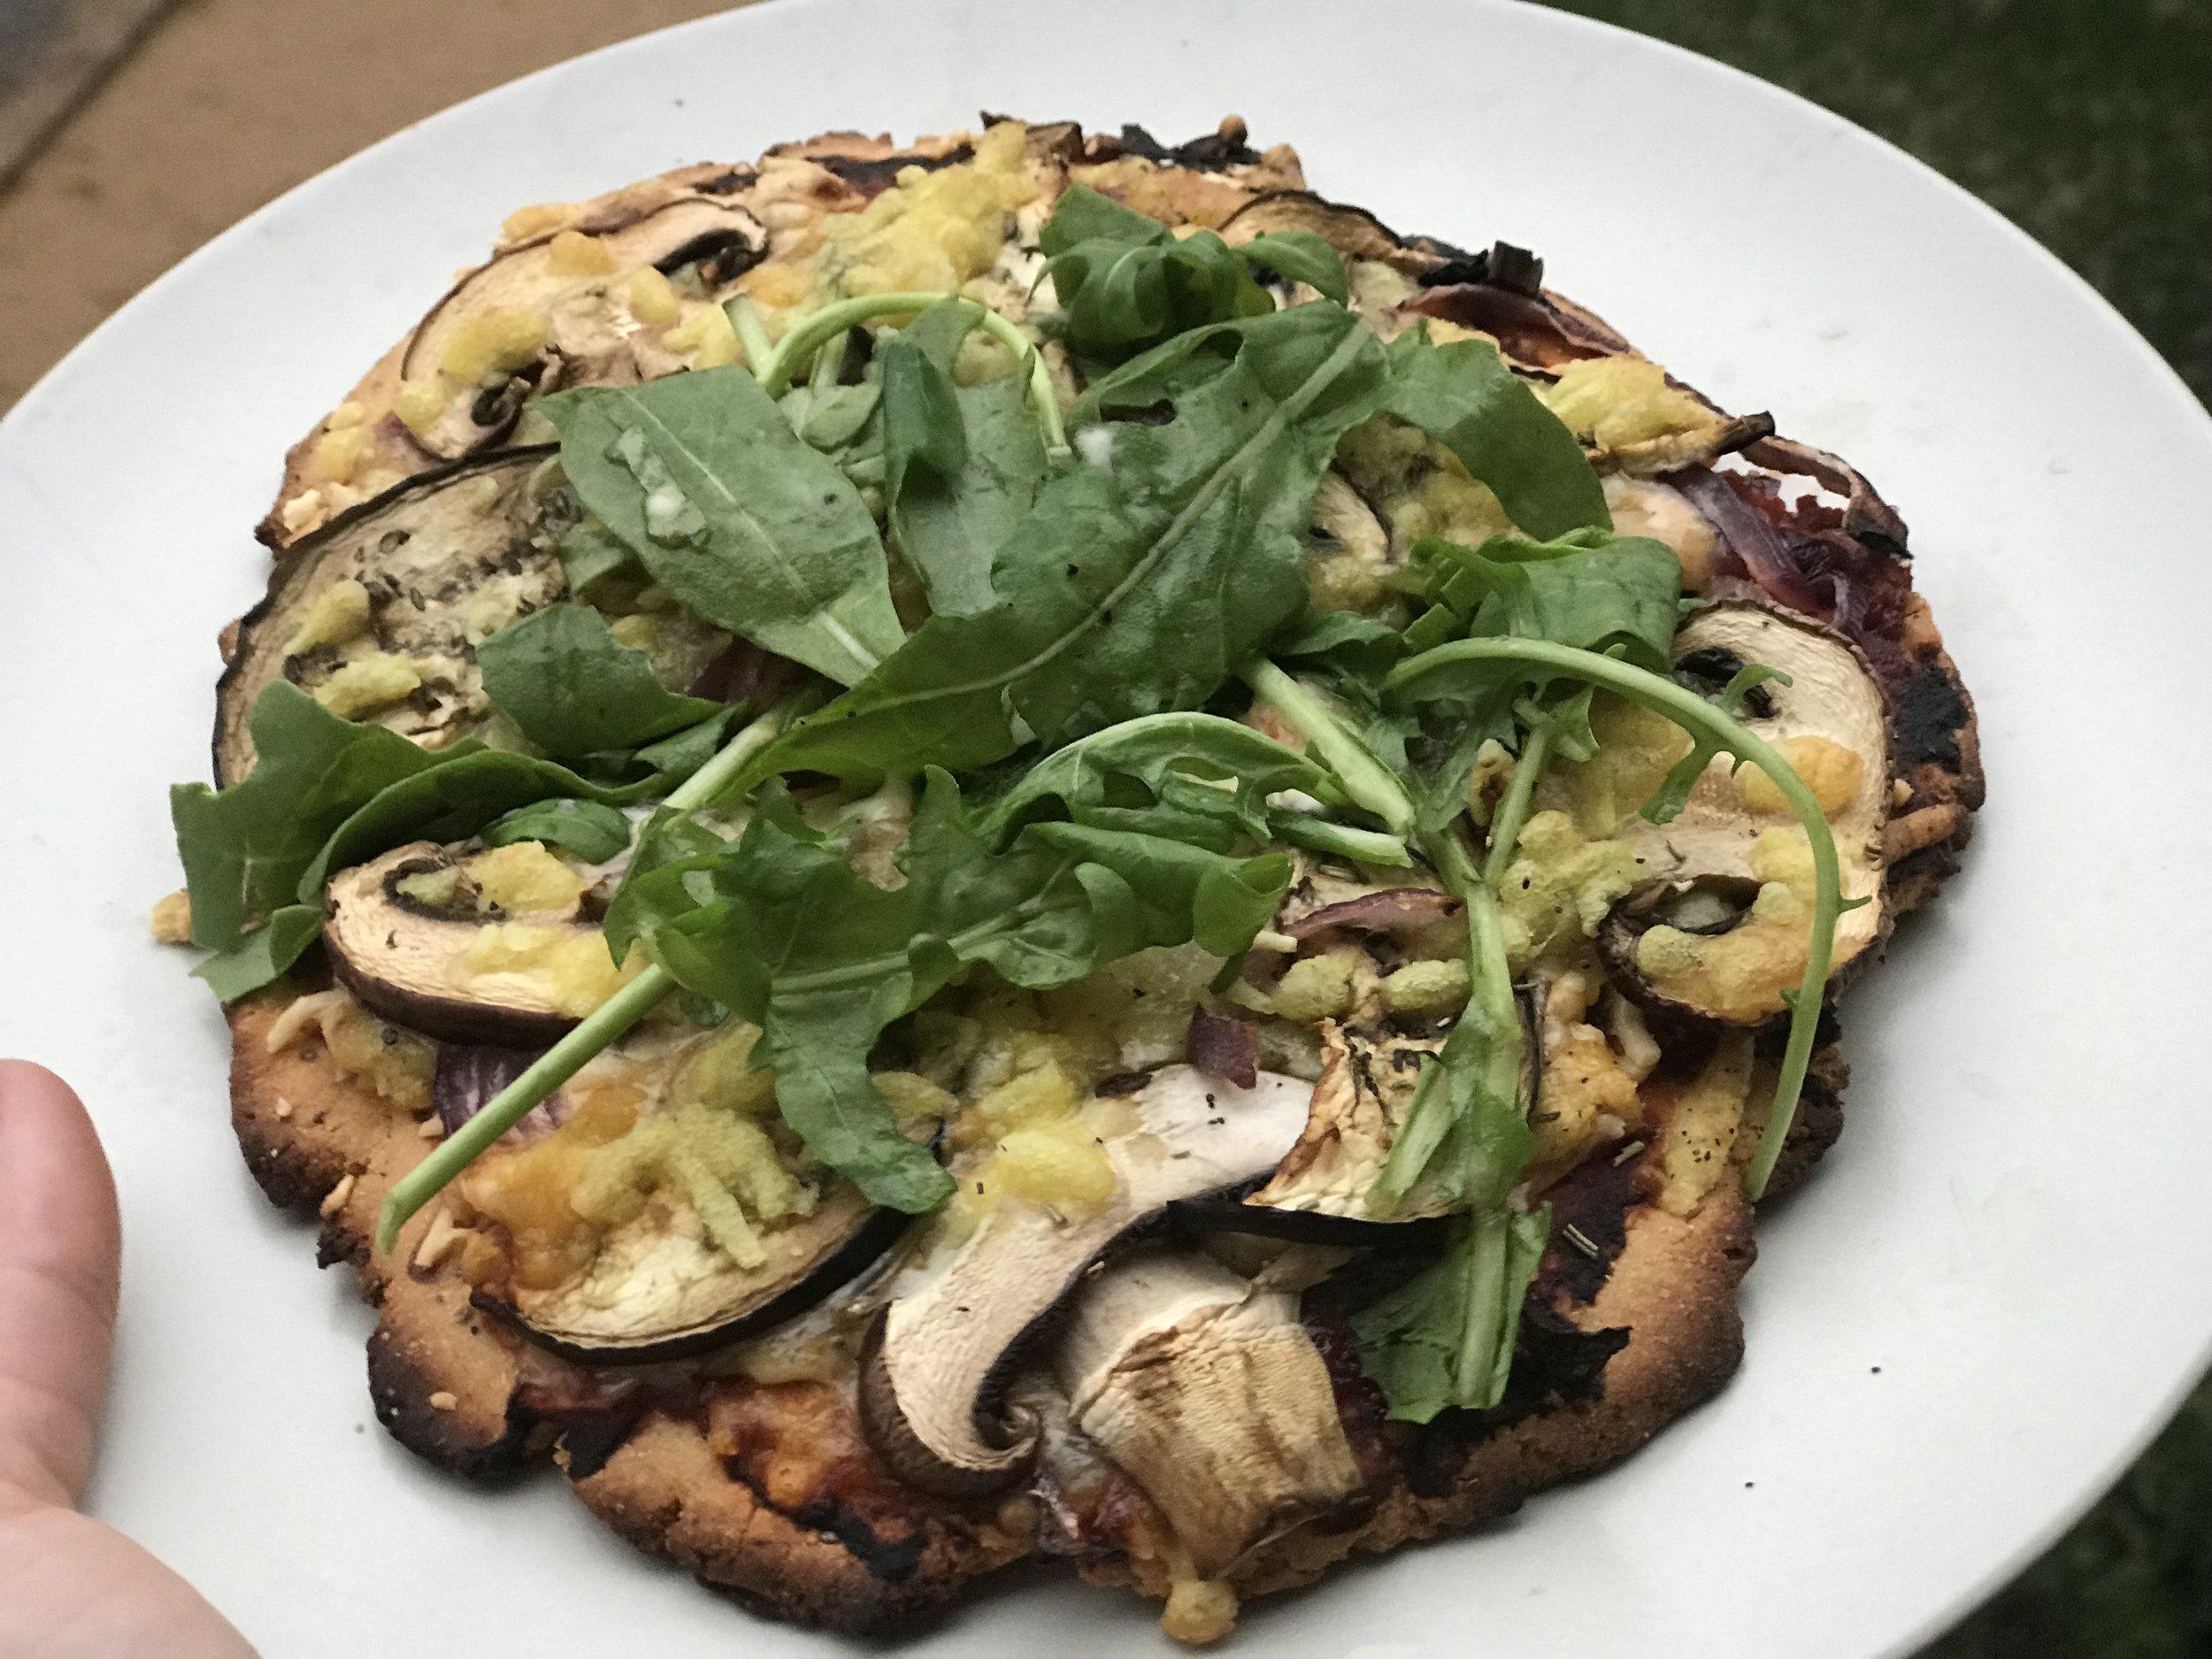 Homemade gluten free vegan pizzas with Eli